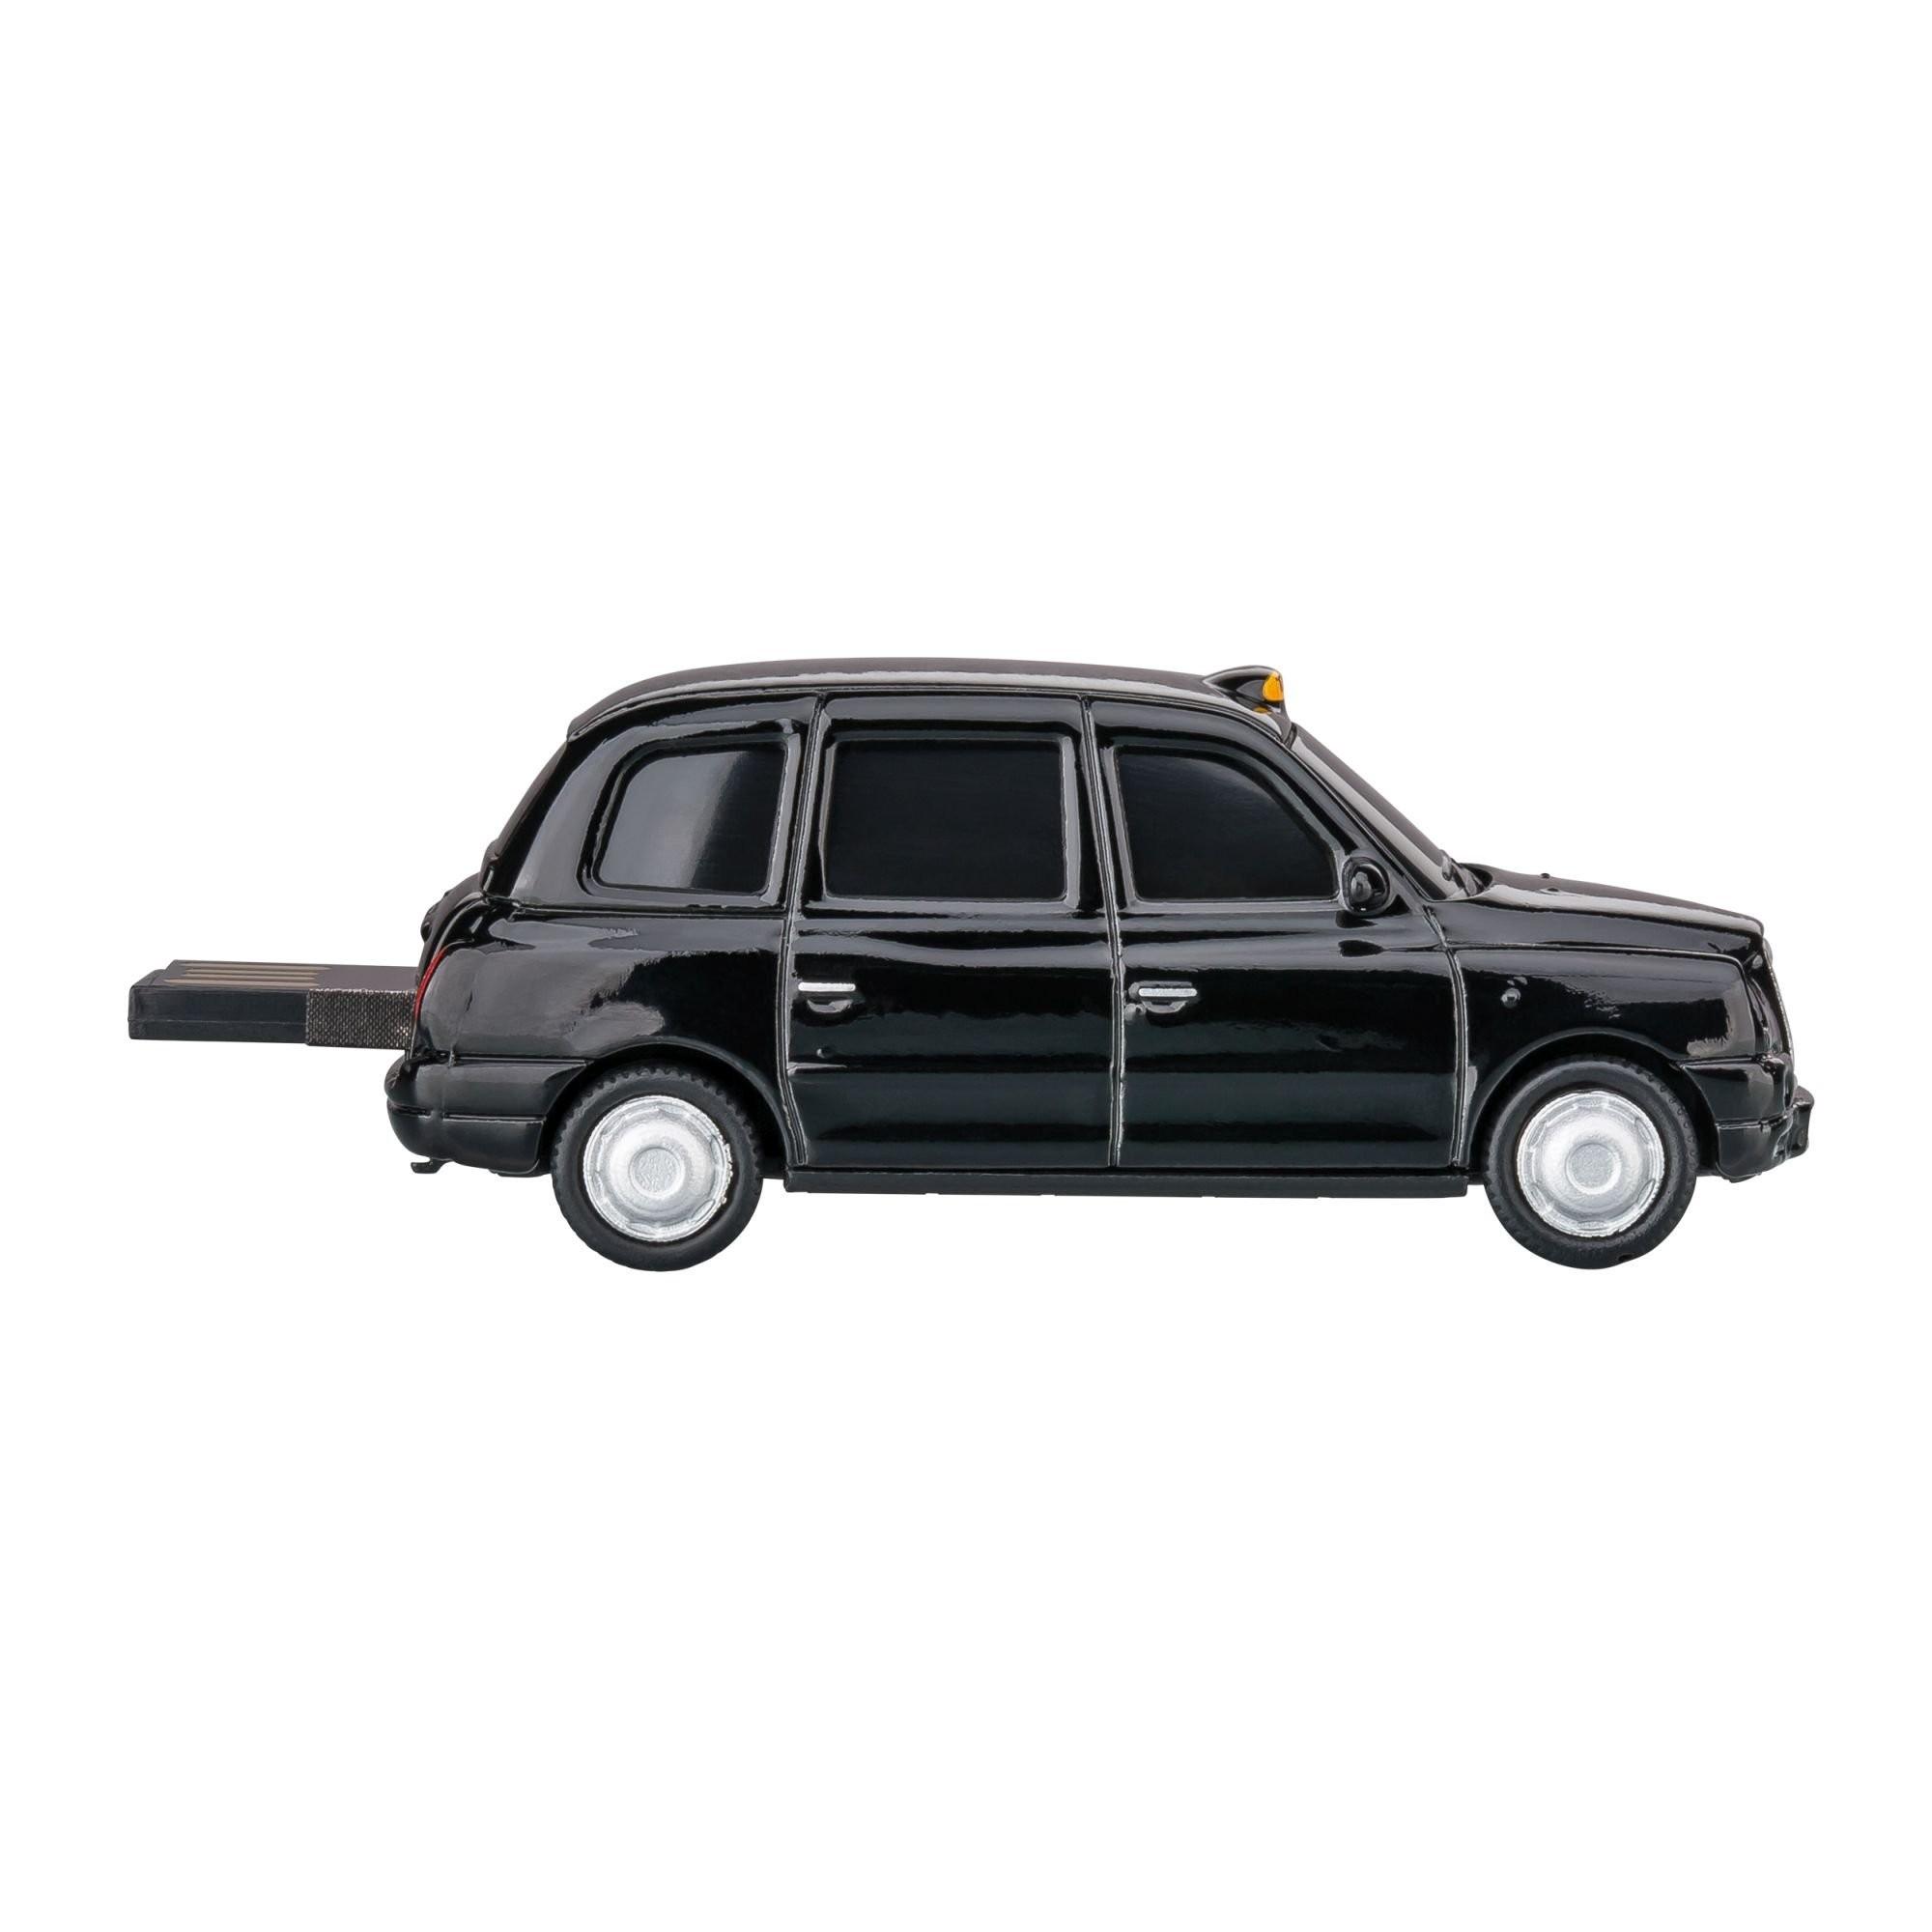 USB flash drive London Taxi TX4 1:72 BLACK 16GB, View 5